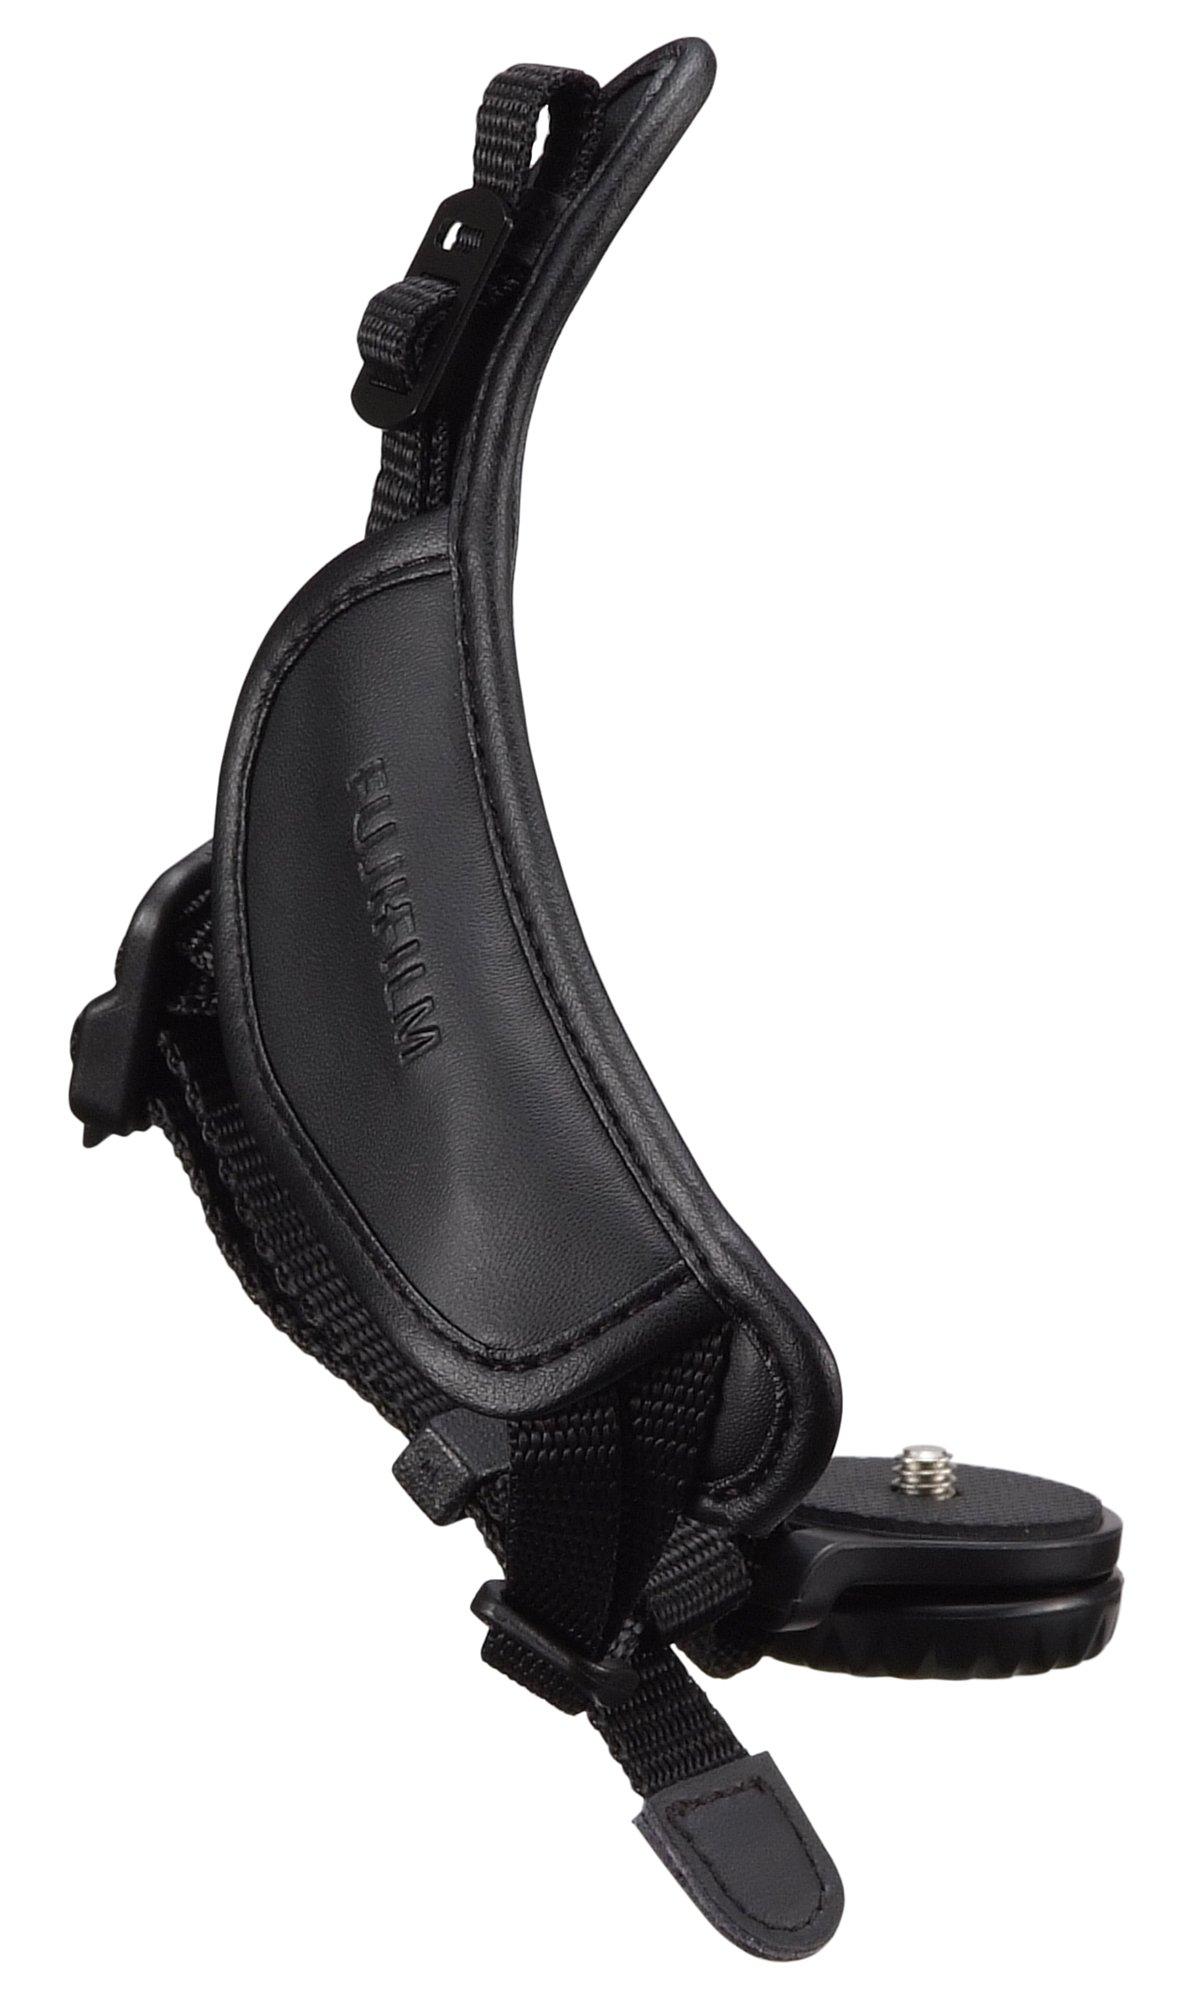 Fujifilm WRST- GB-001 Wrist Strap (Black) by Fujifilm